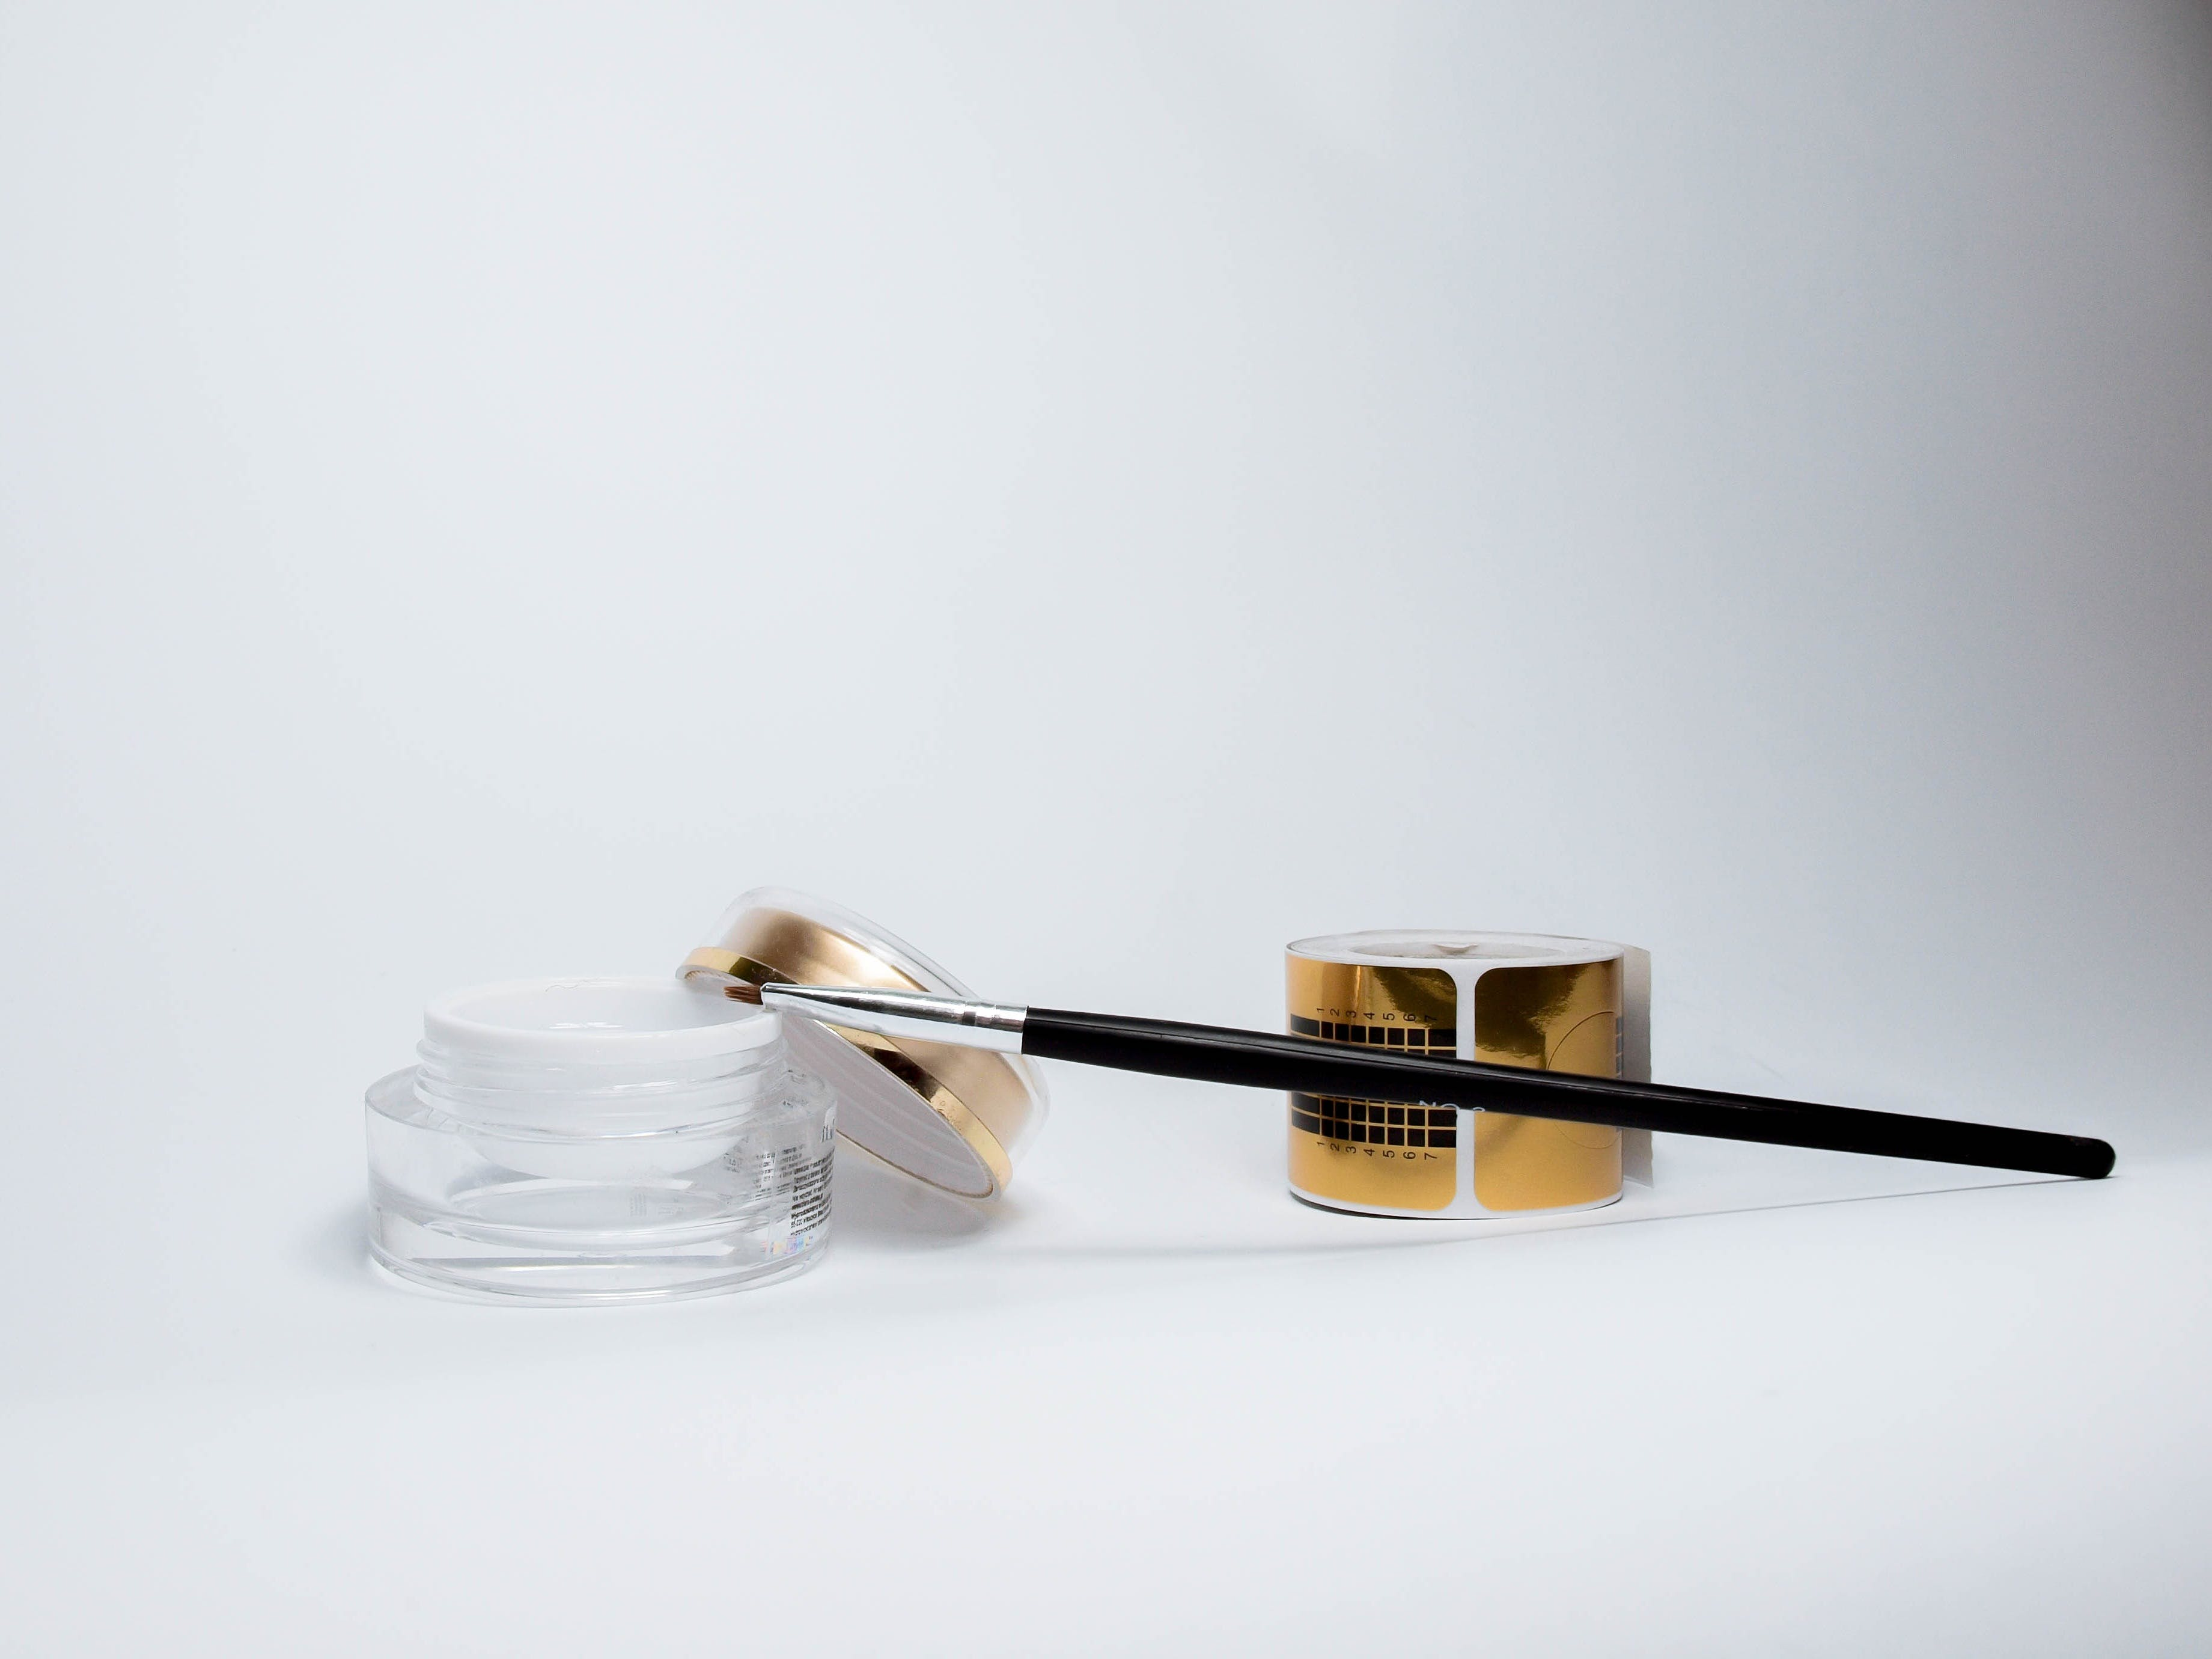 brush, close-up, cosmetics